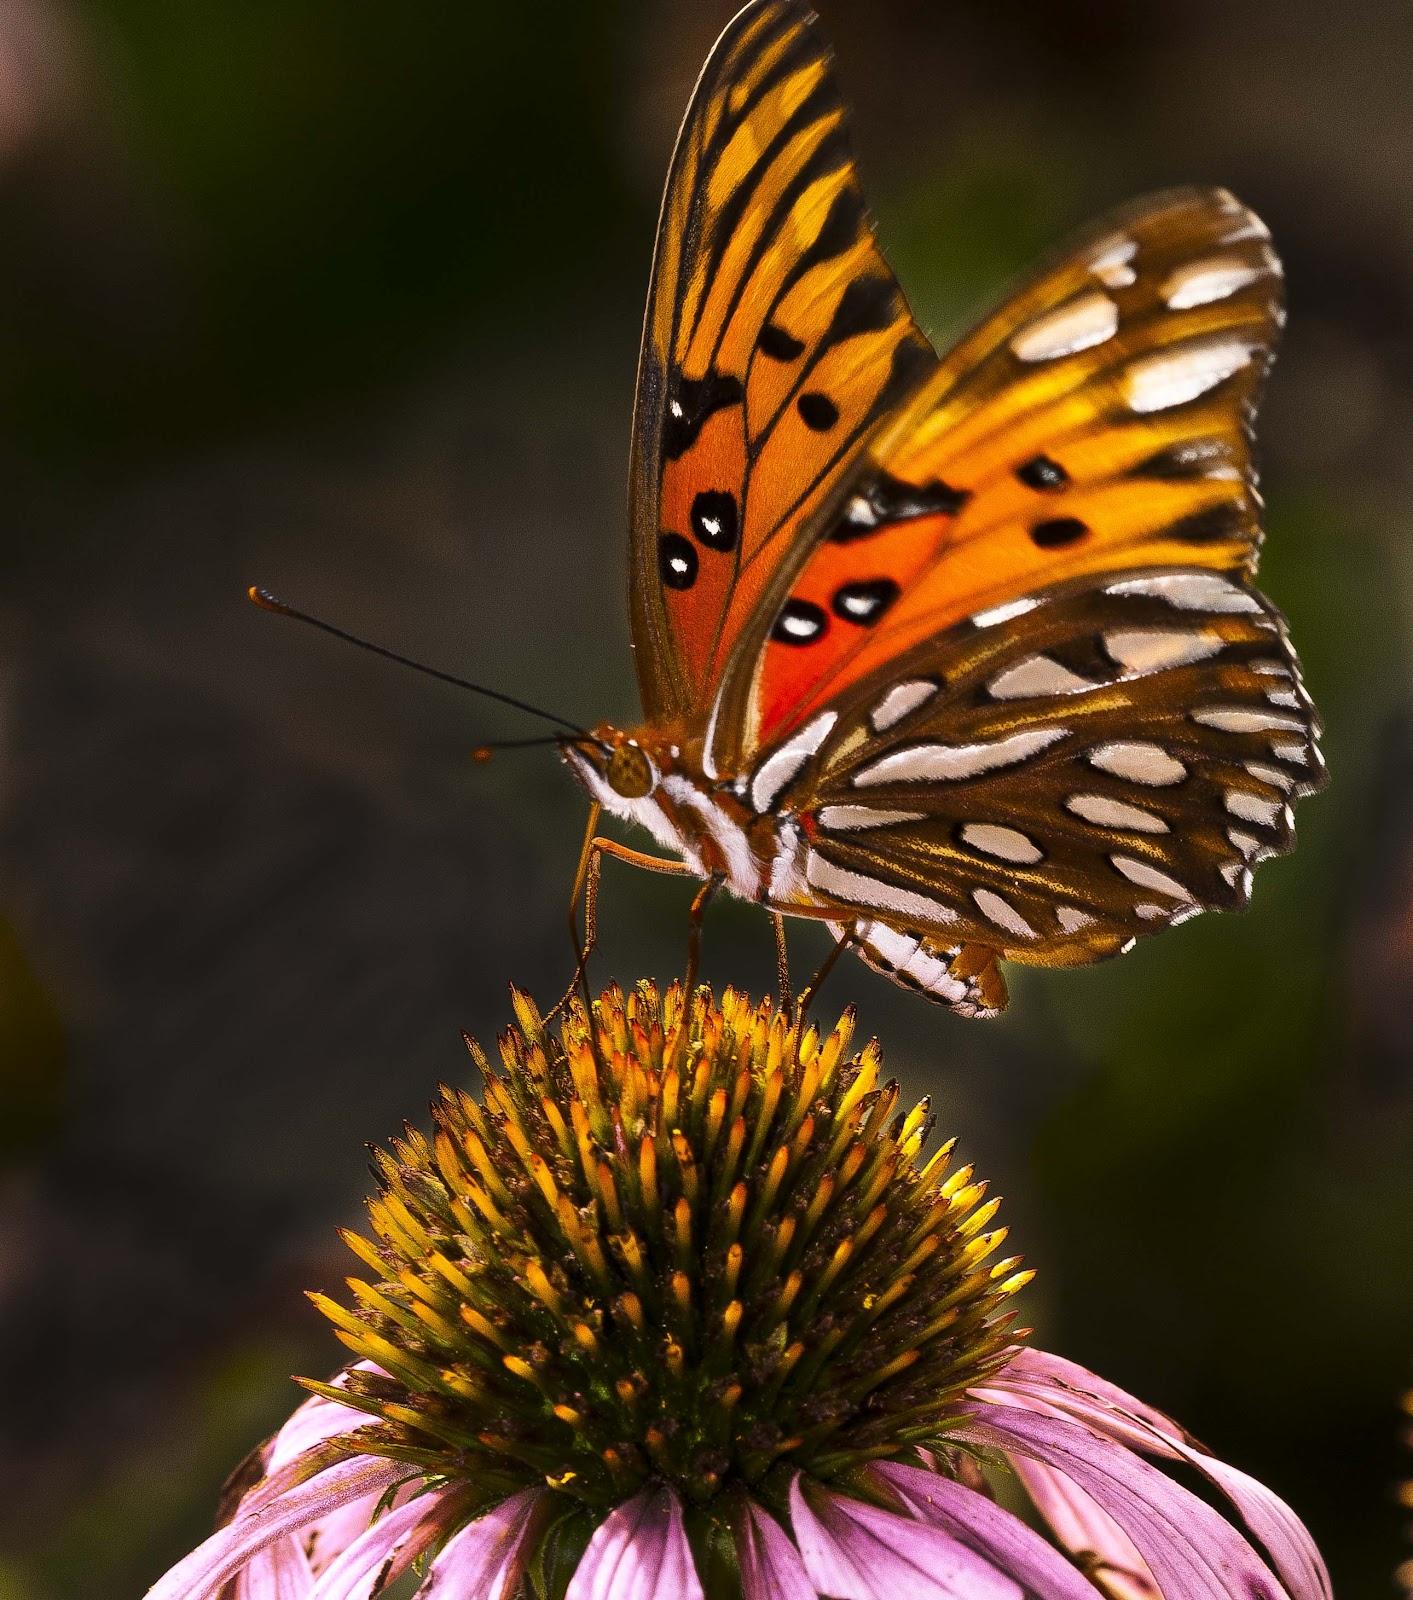 native plants kentucky plant species butterflies wildlife milkweed backlit nectar known attracting purple swamp admirals